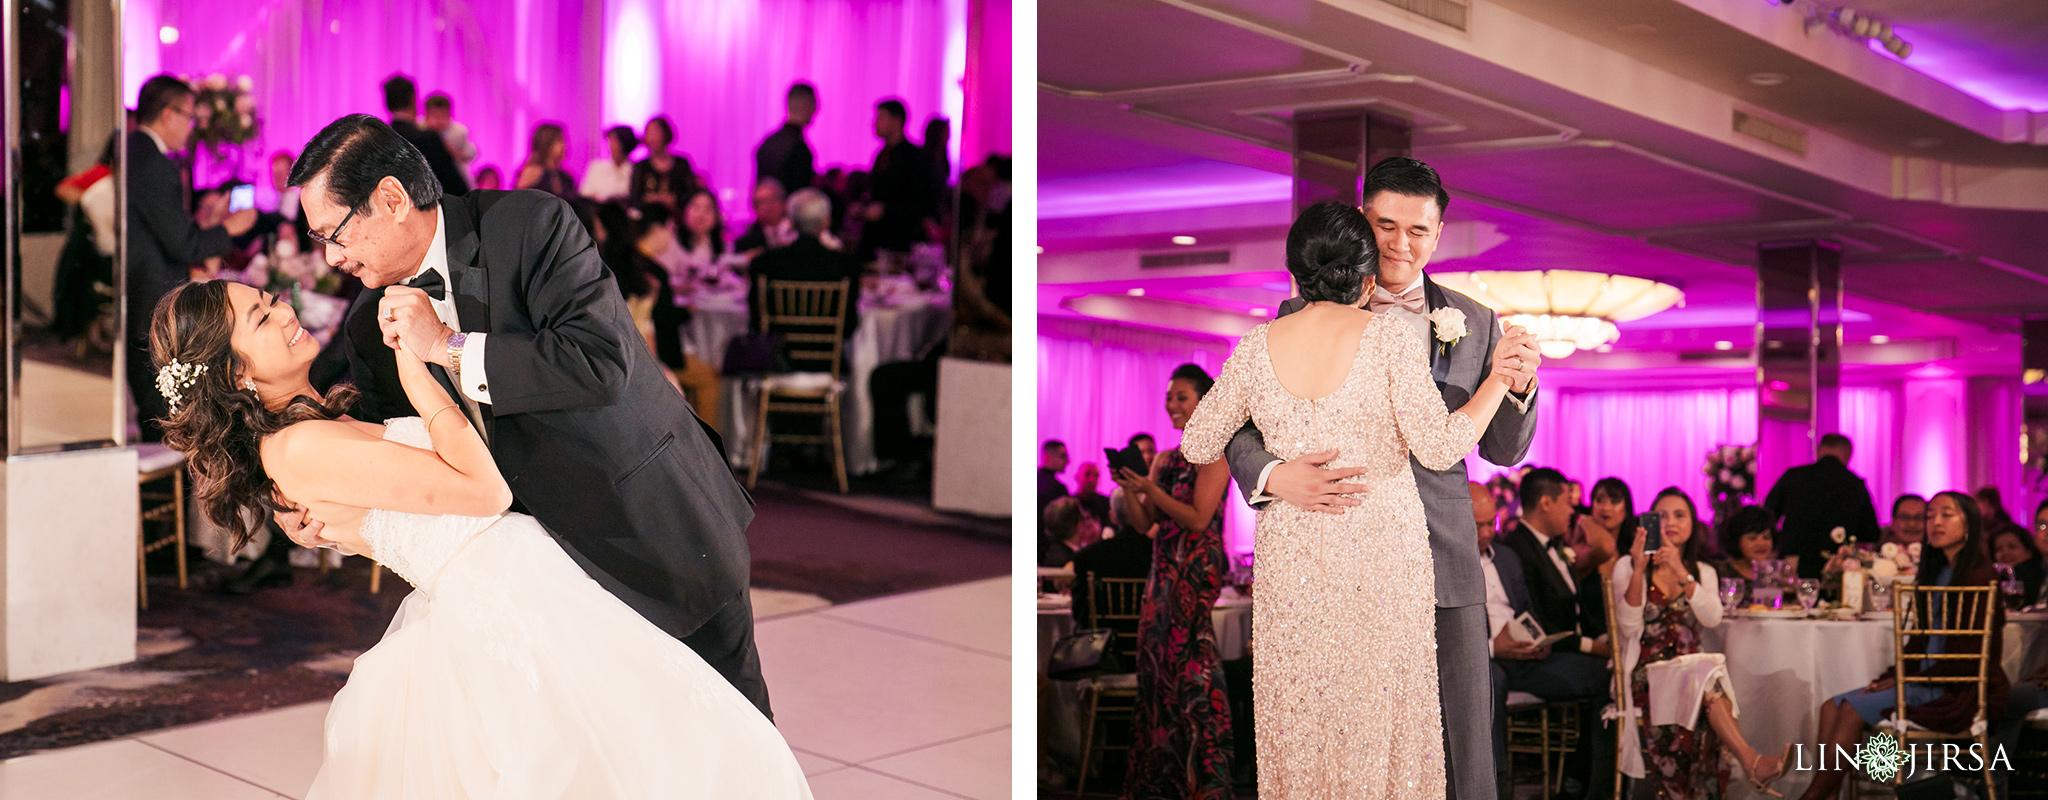 33 grandview ballroom glendale wedding photography